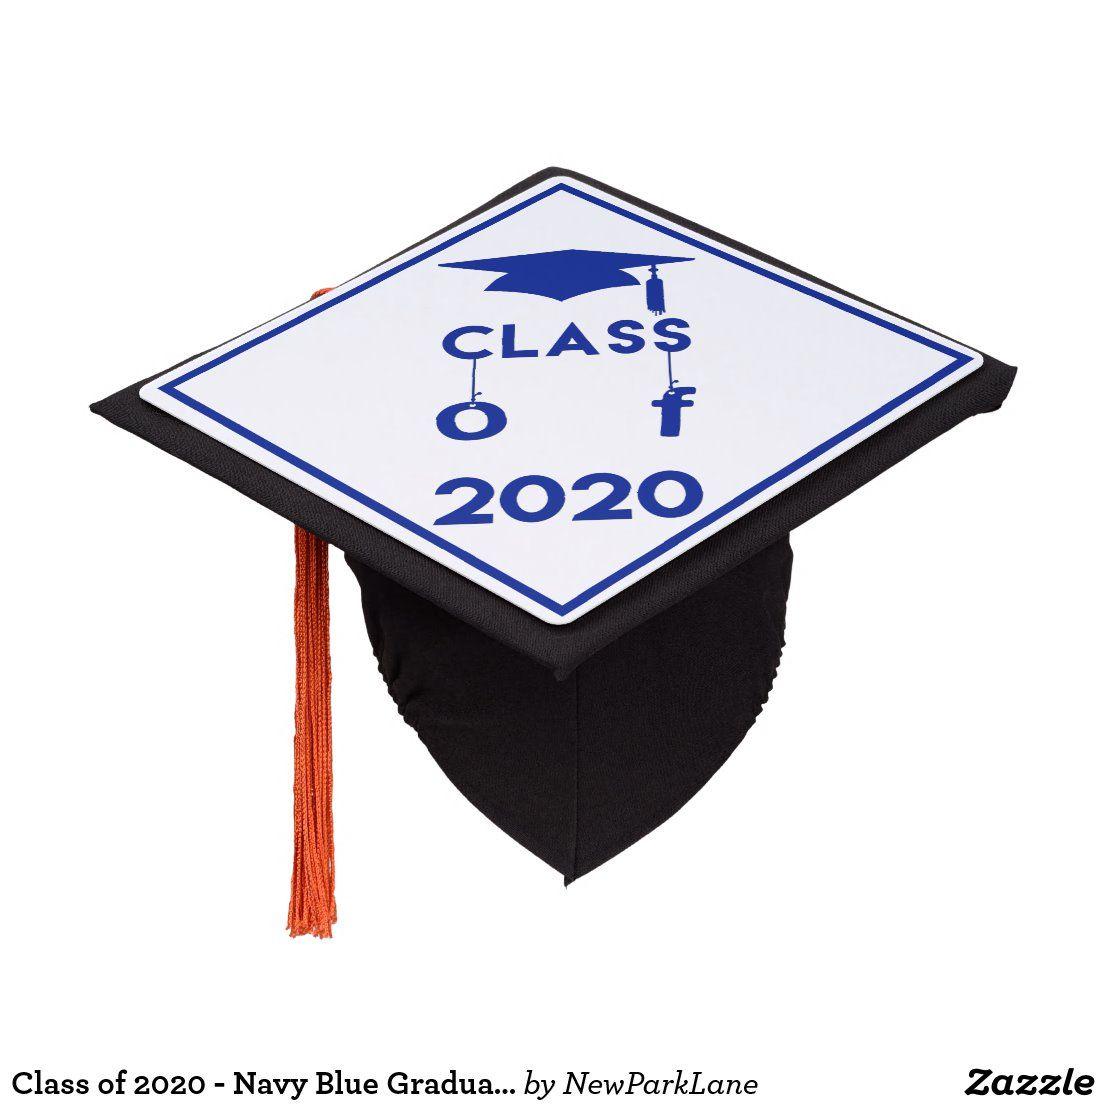 Class Of 2020 Navy Blue Graduation Graduation Cap Topper Zazzle Com In 2020 Blue Graduation Graduation Cap Toppers Graduation Cap